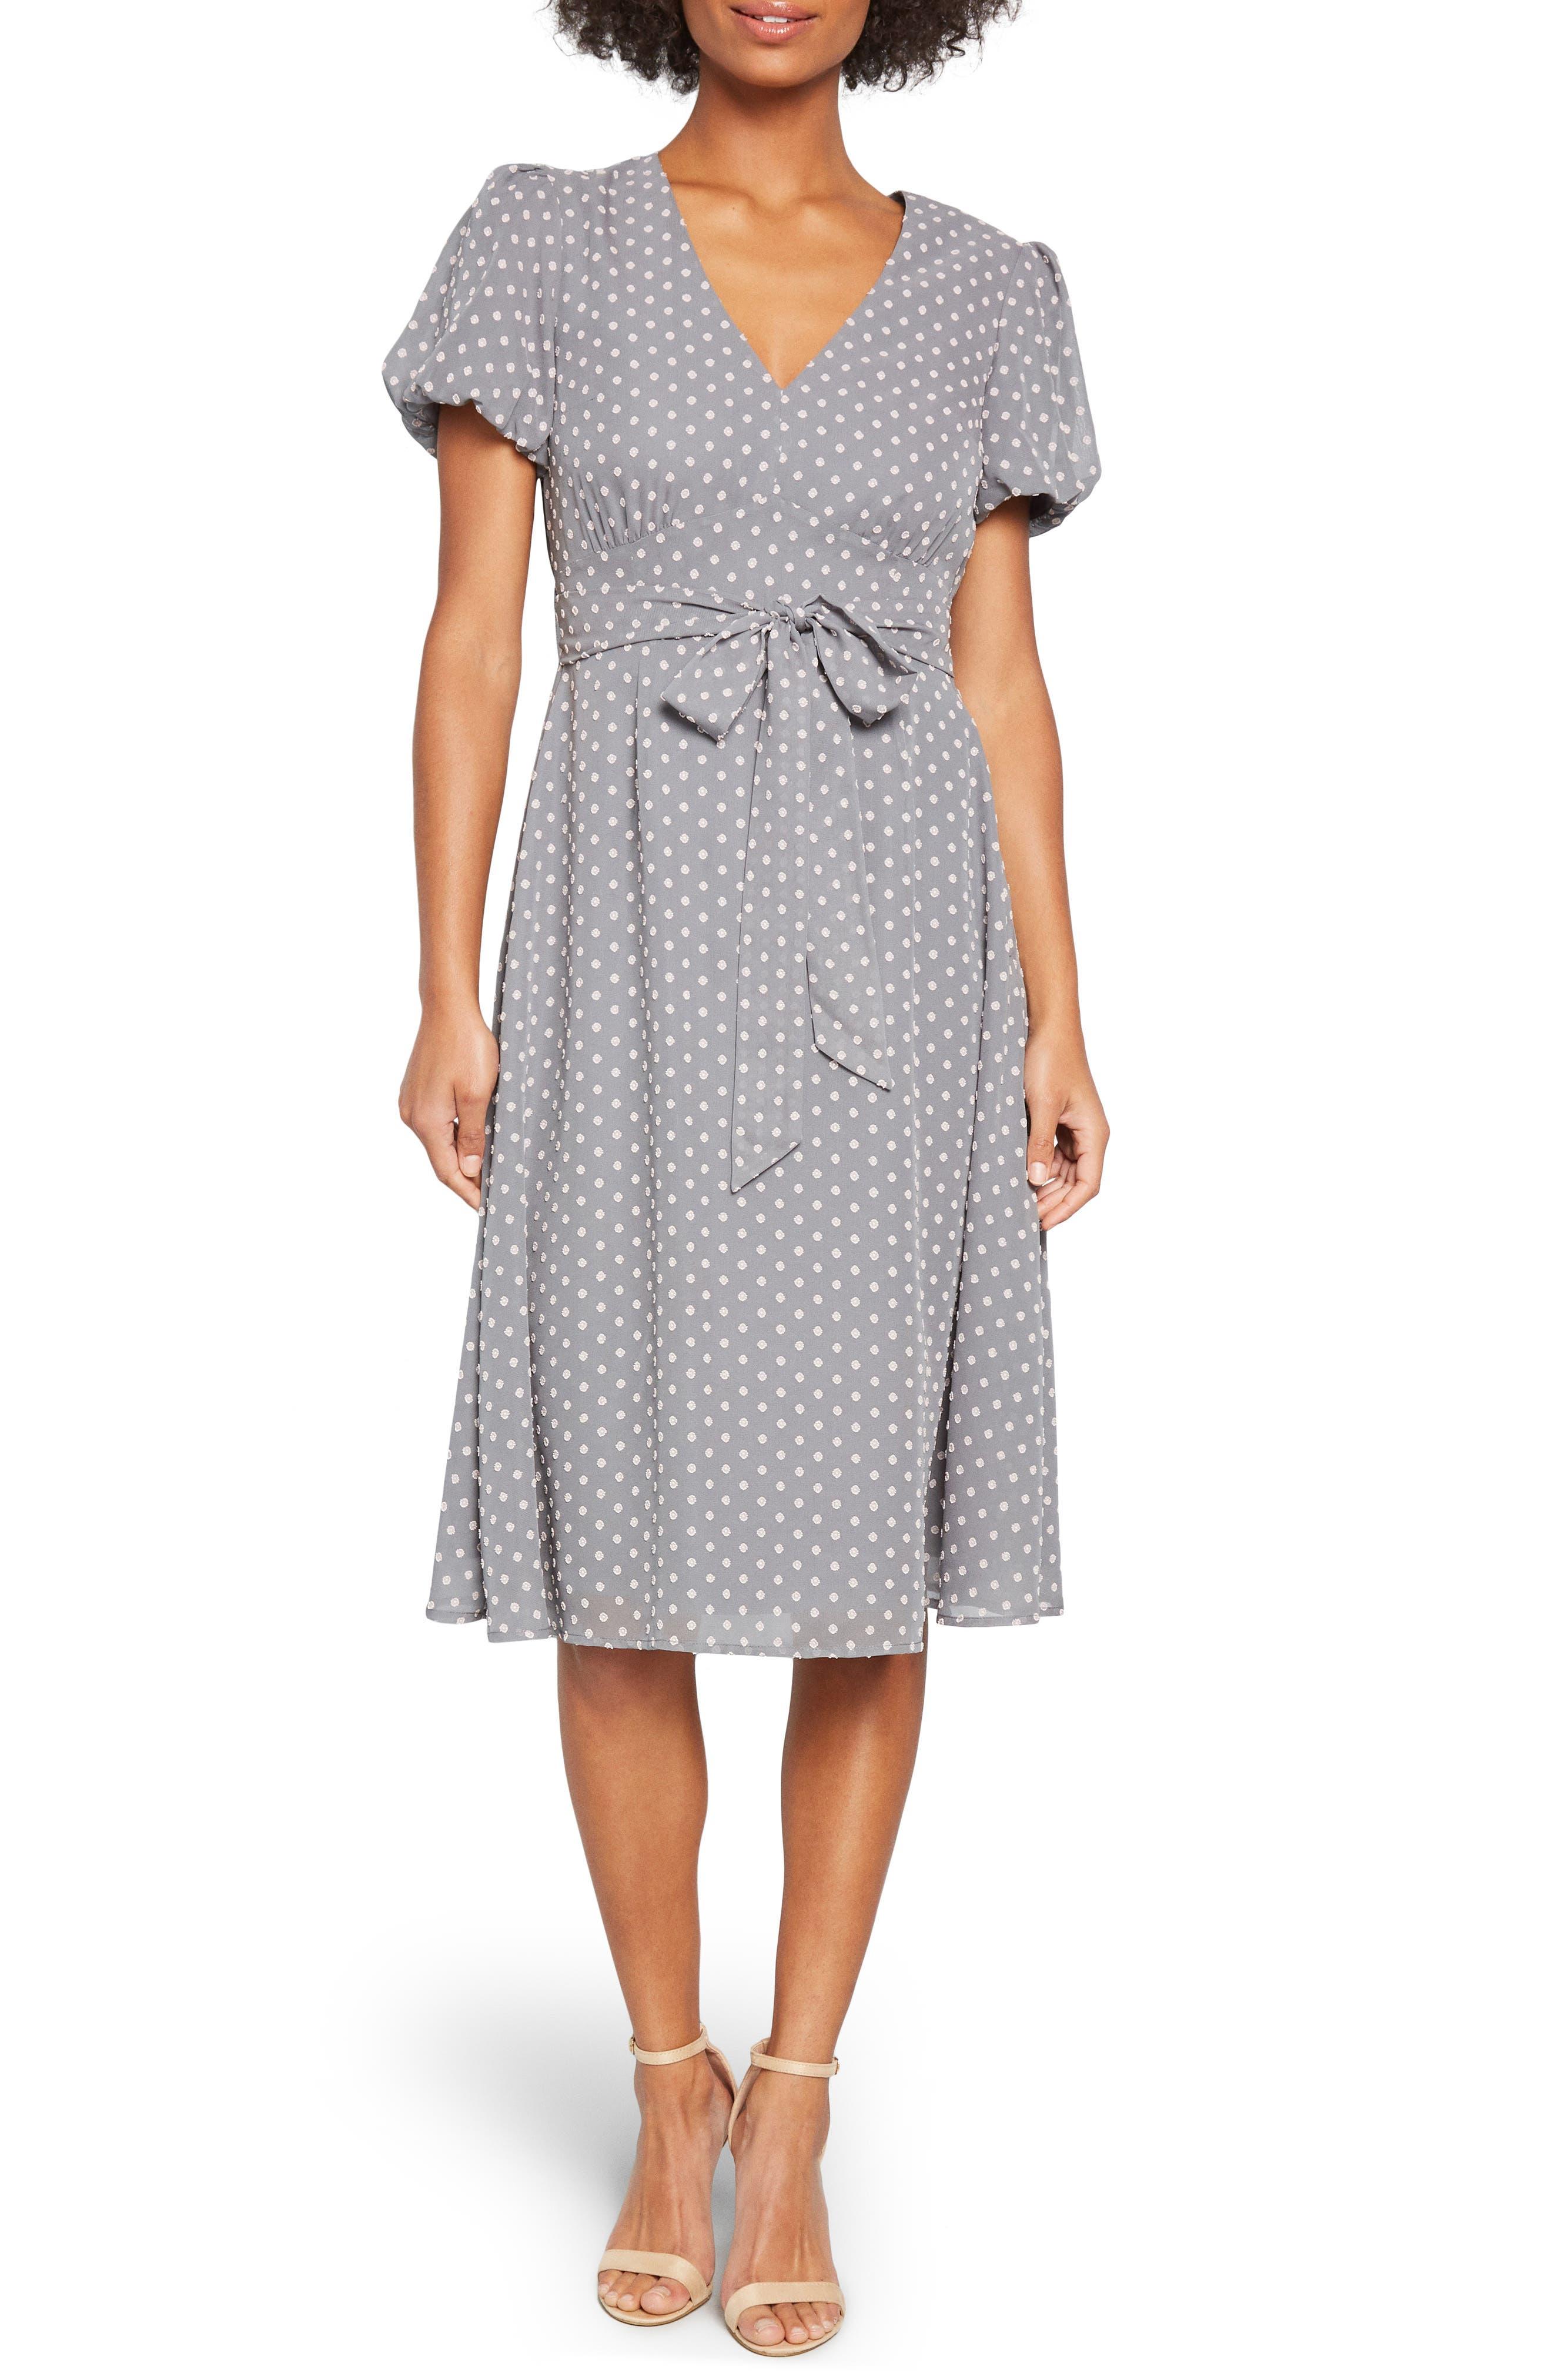 1930s Clothing Womens Modcloth Clip Dot Puff Sleeve Dress $99.00 AT vintagedancer.com